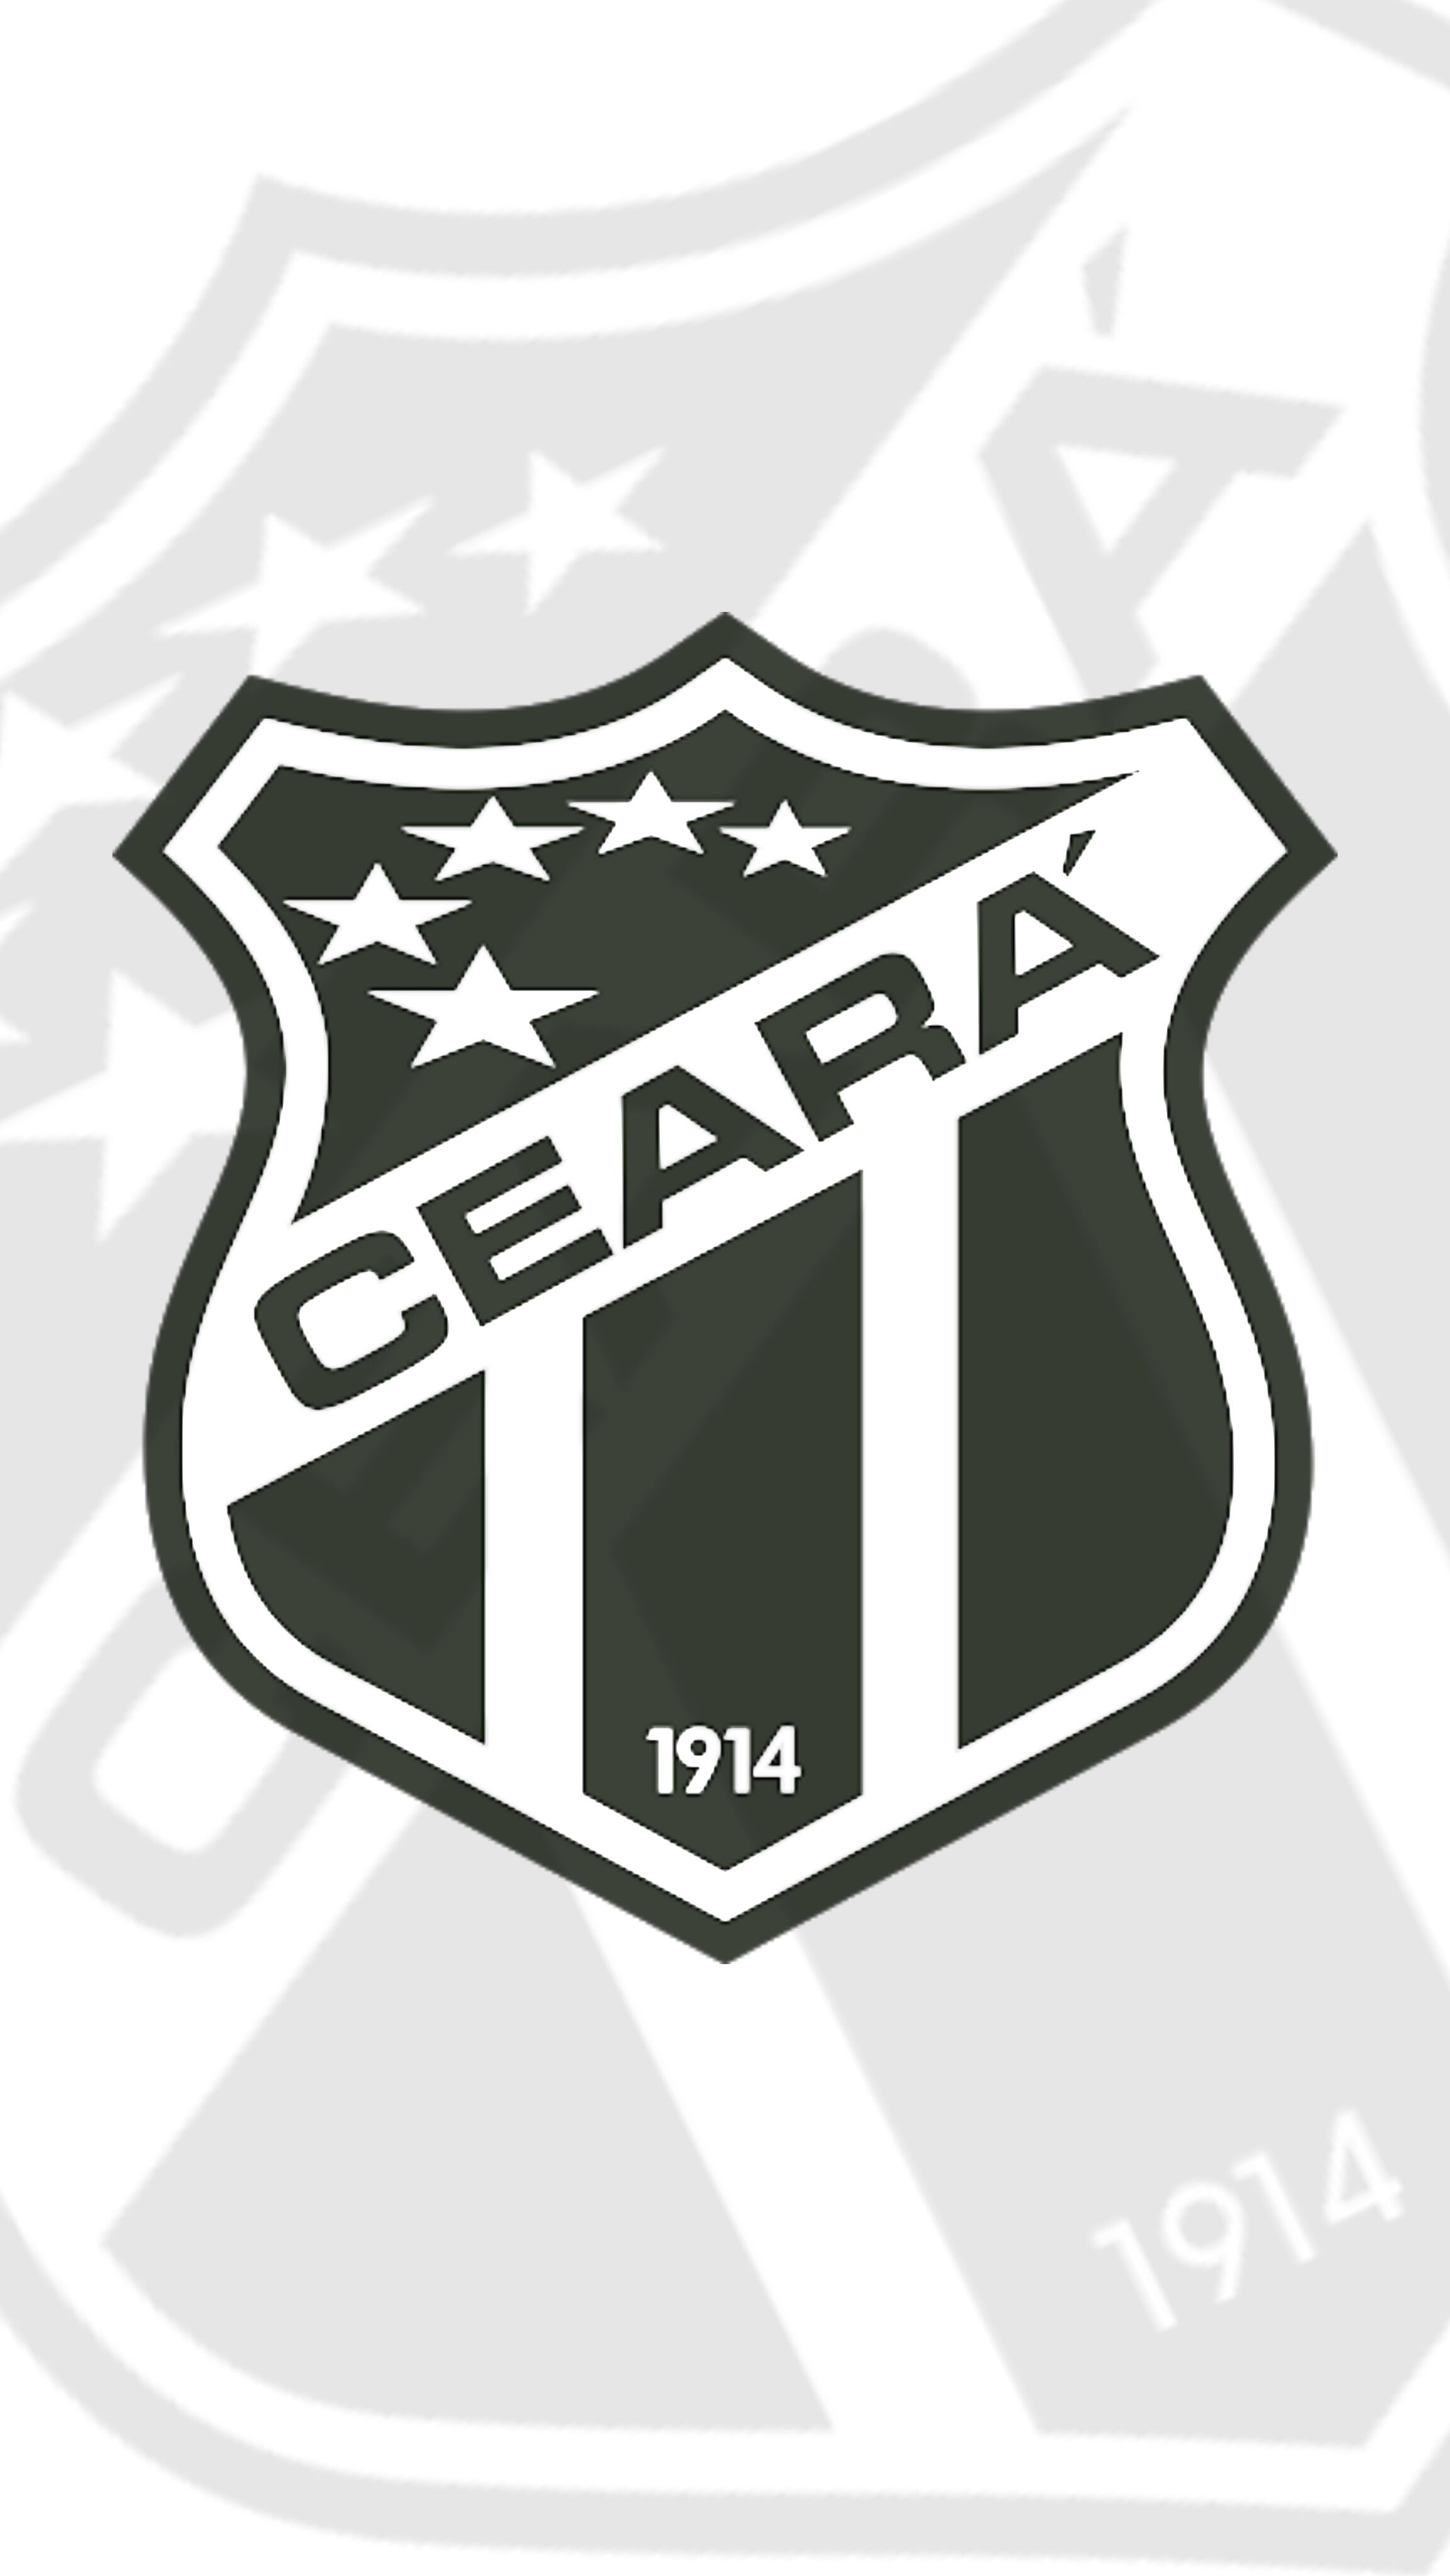 Wallpaper Para Celular Papel De Parede Ceara Vozao Futebol Time Simples Clean Claro Feito No Pixlr Ceara Sporting Ceara Futebol Ceara Sporting Club